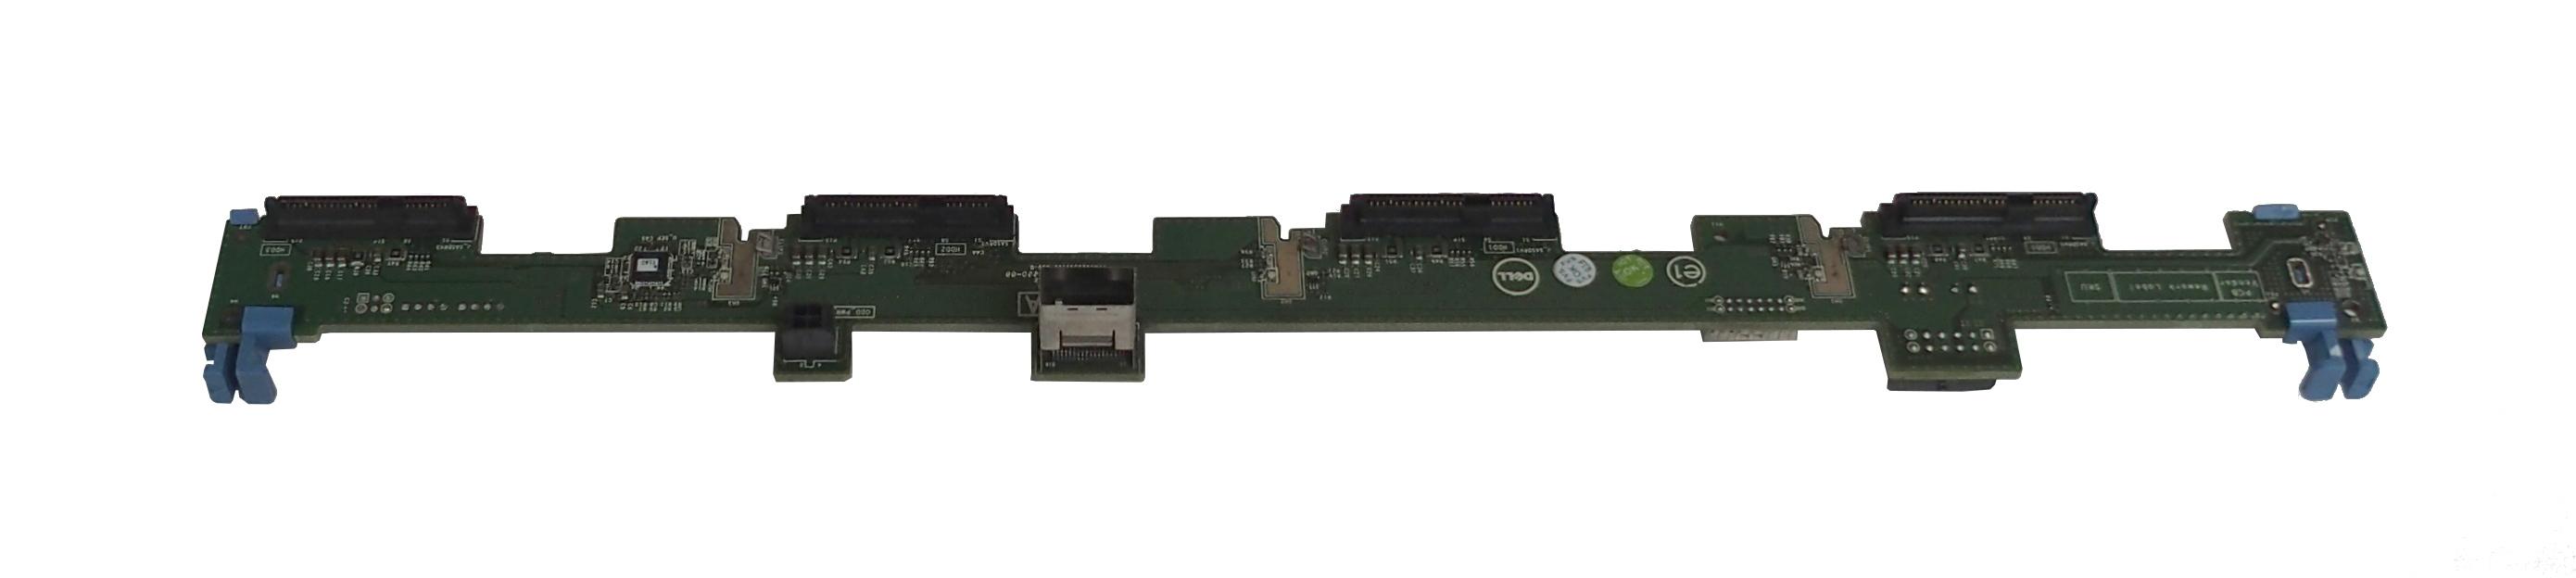 "Dell P7H13 SAS/SATA 4 x 3.5"" HDD Backplane Board For PowerEdge R320/R420 Server"